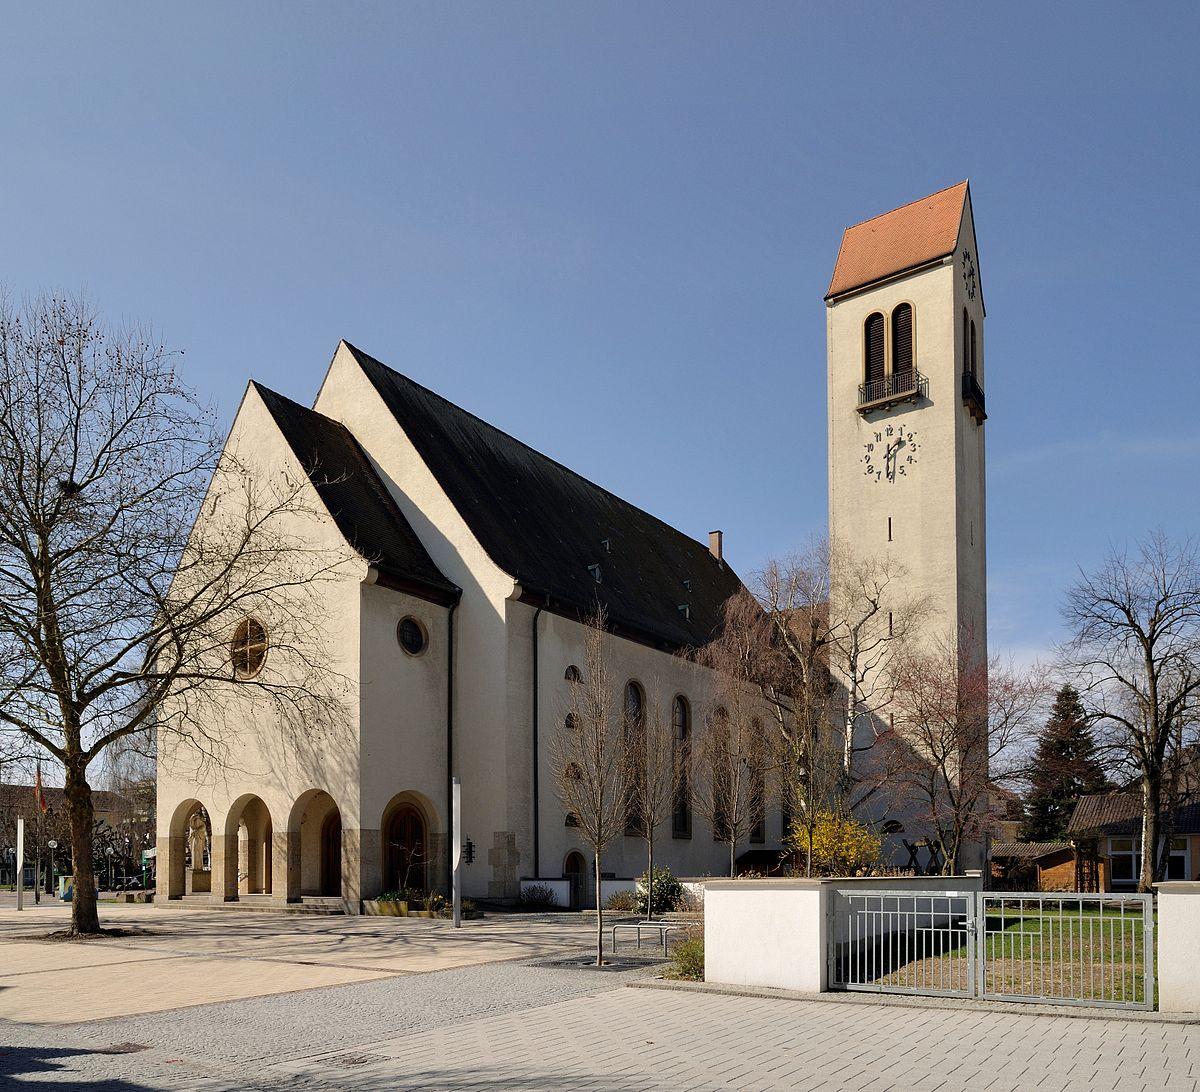 Christuskirche rheinfelden baden wikipedia for Freibad rheinfelden baden